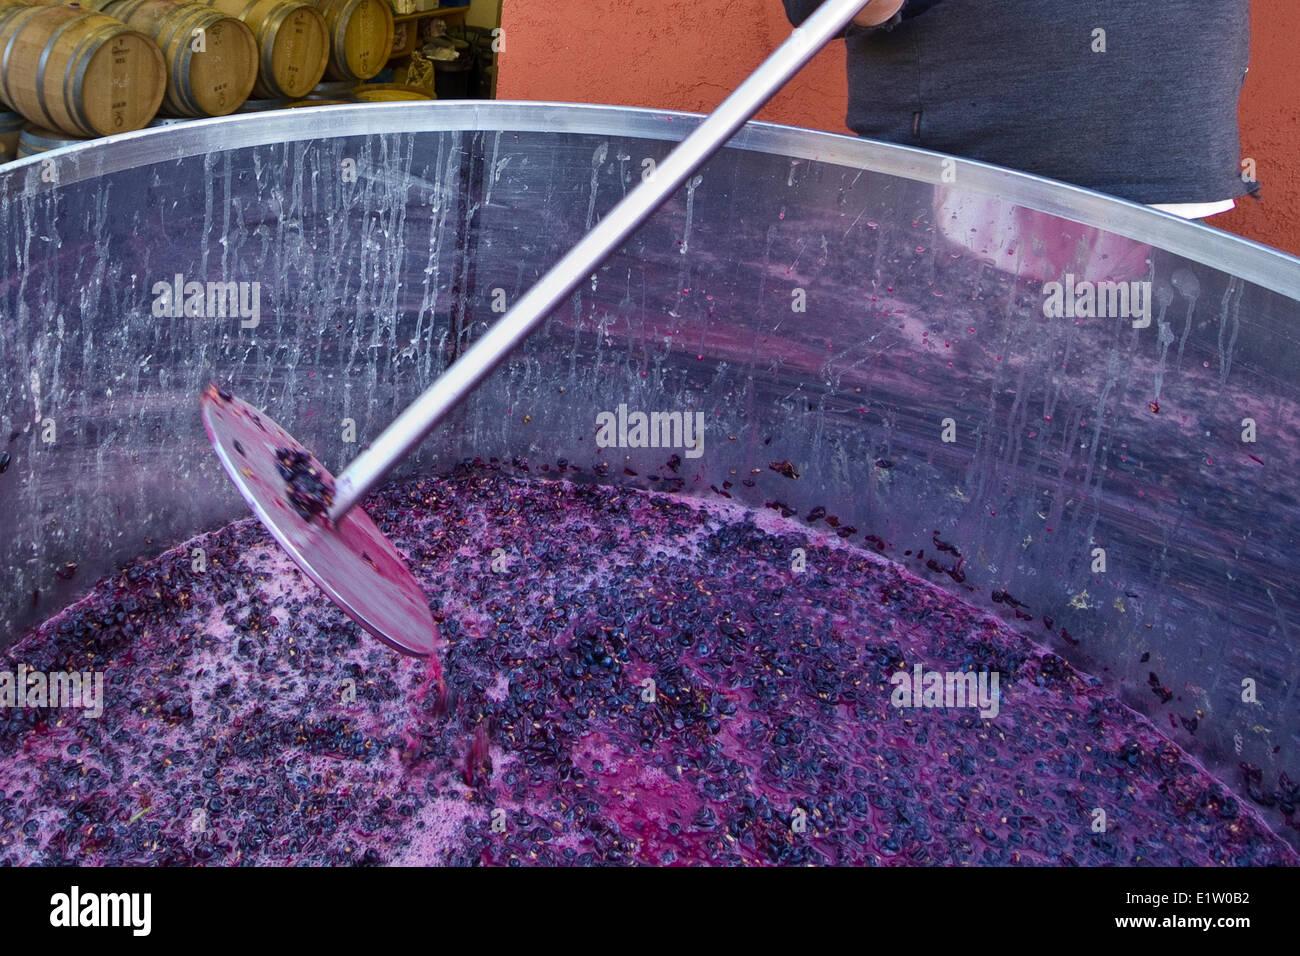 Pinot Noir grapes in vat after crush during harvest, Meyer Family Vineyards, Okanagan Falls, BC, Canada. - Stock Image